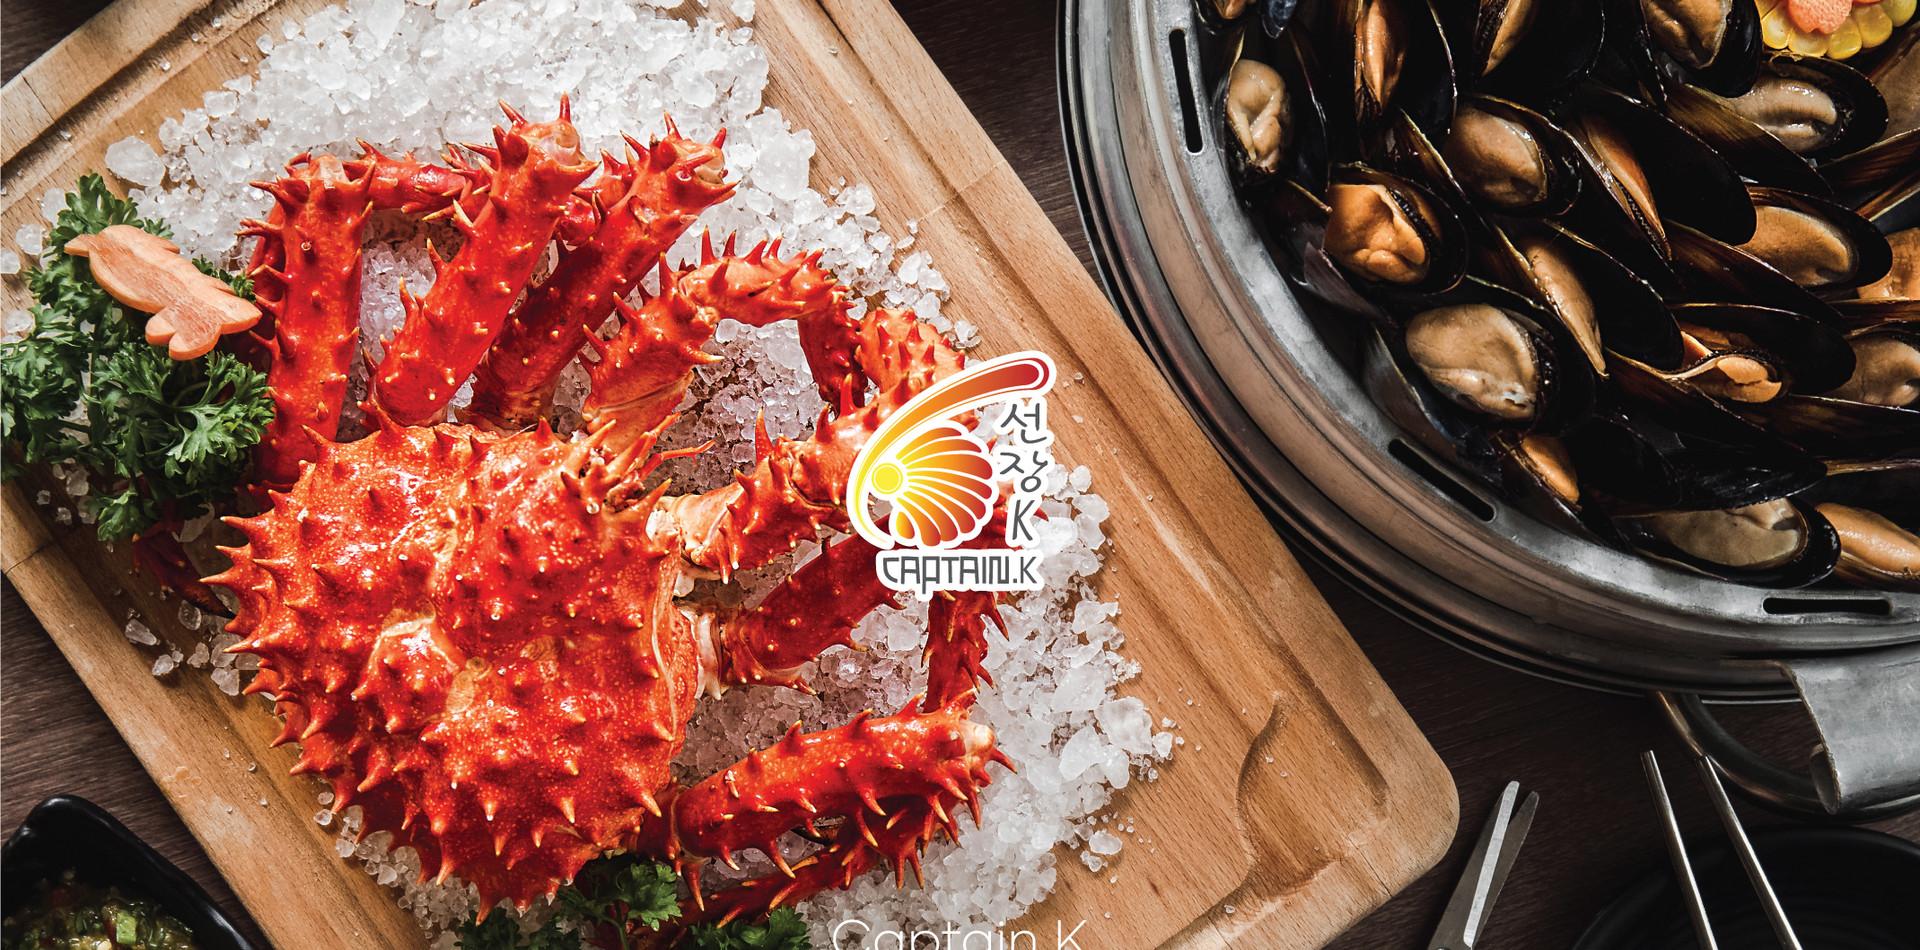 Branding - Captain K Seafood Tower & Hot Pot